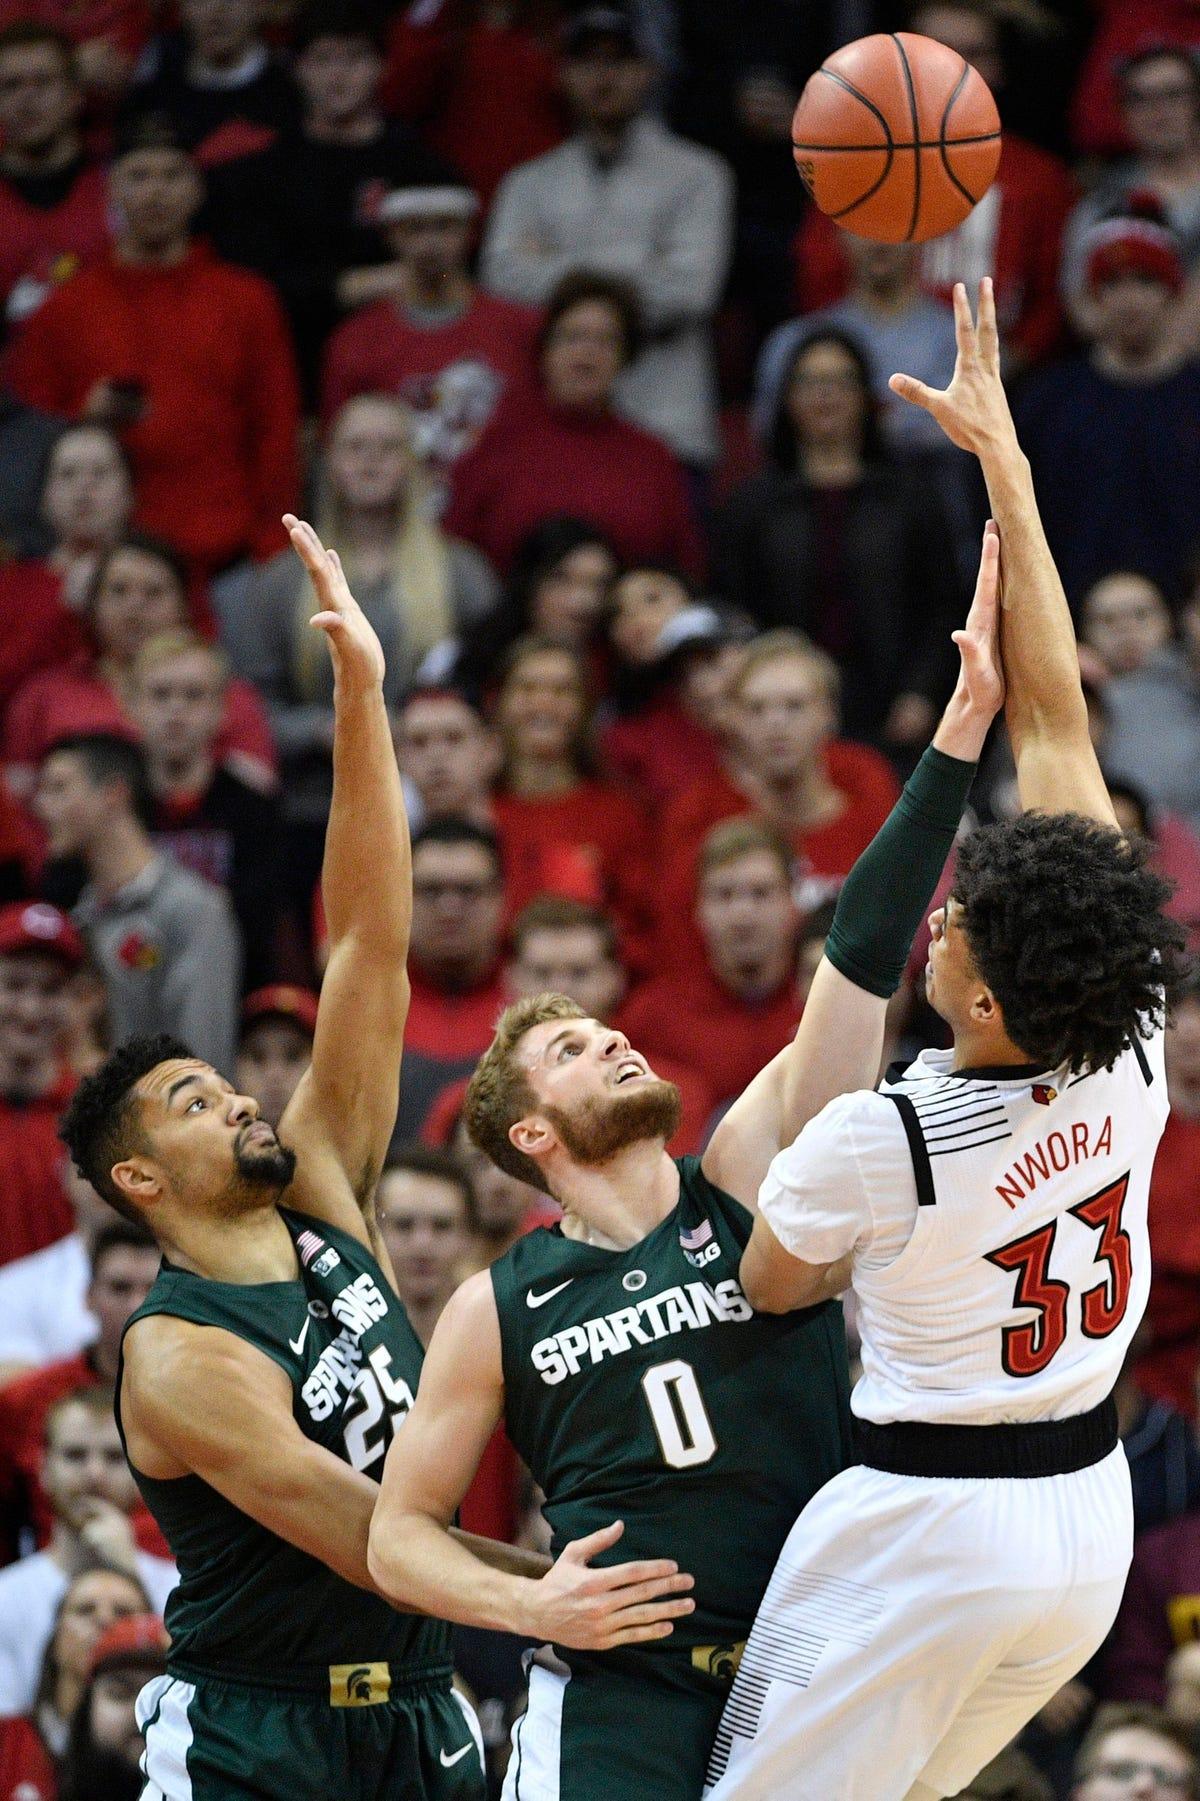 MSU vs  Louisville basketball: Kenny Goins 17 rebounds, 1 eye